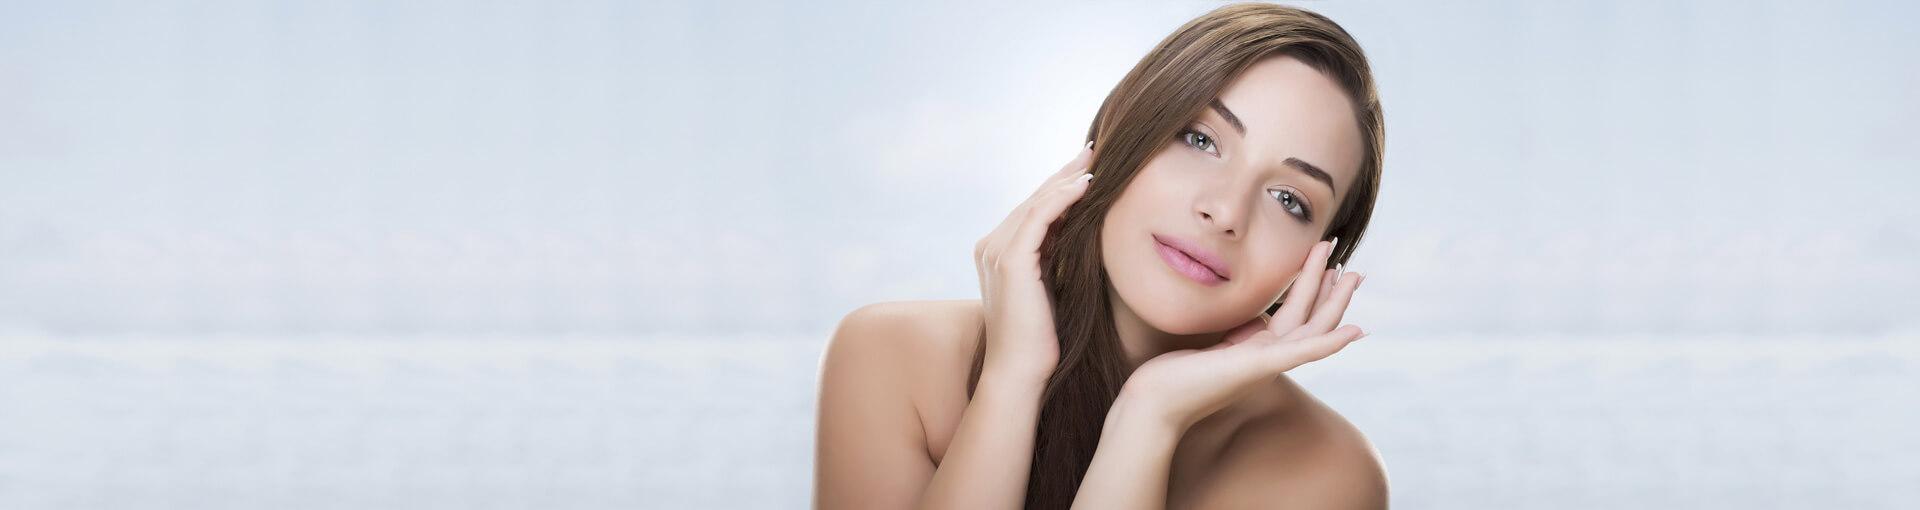 Rosacea - drs skin care